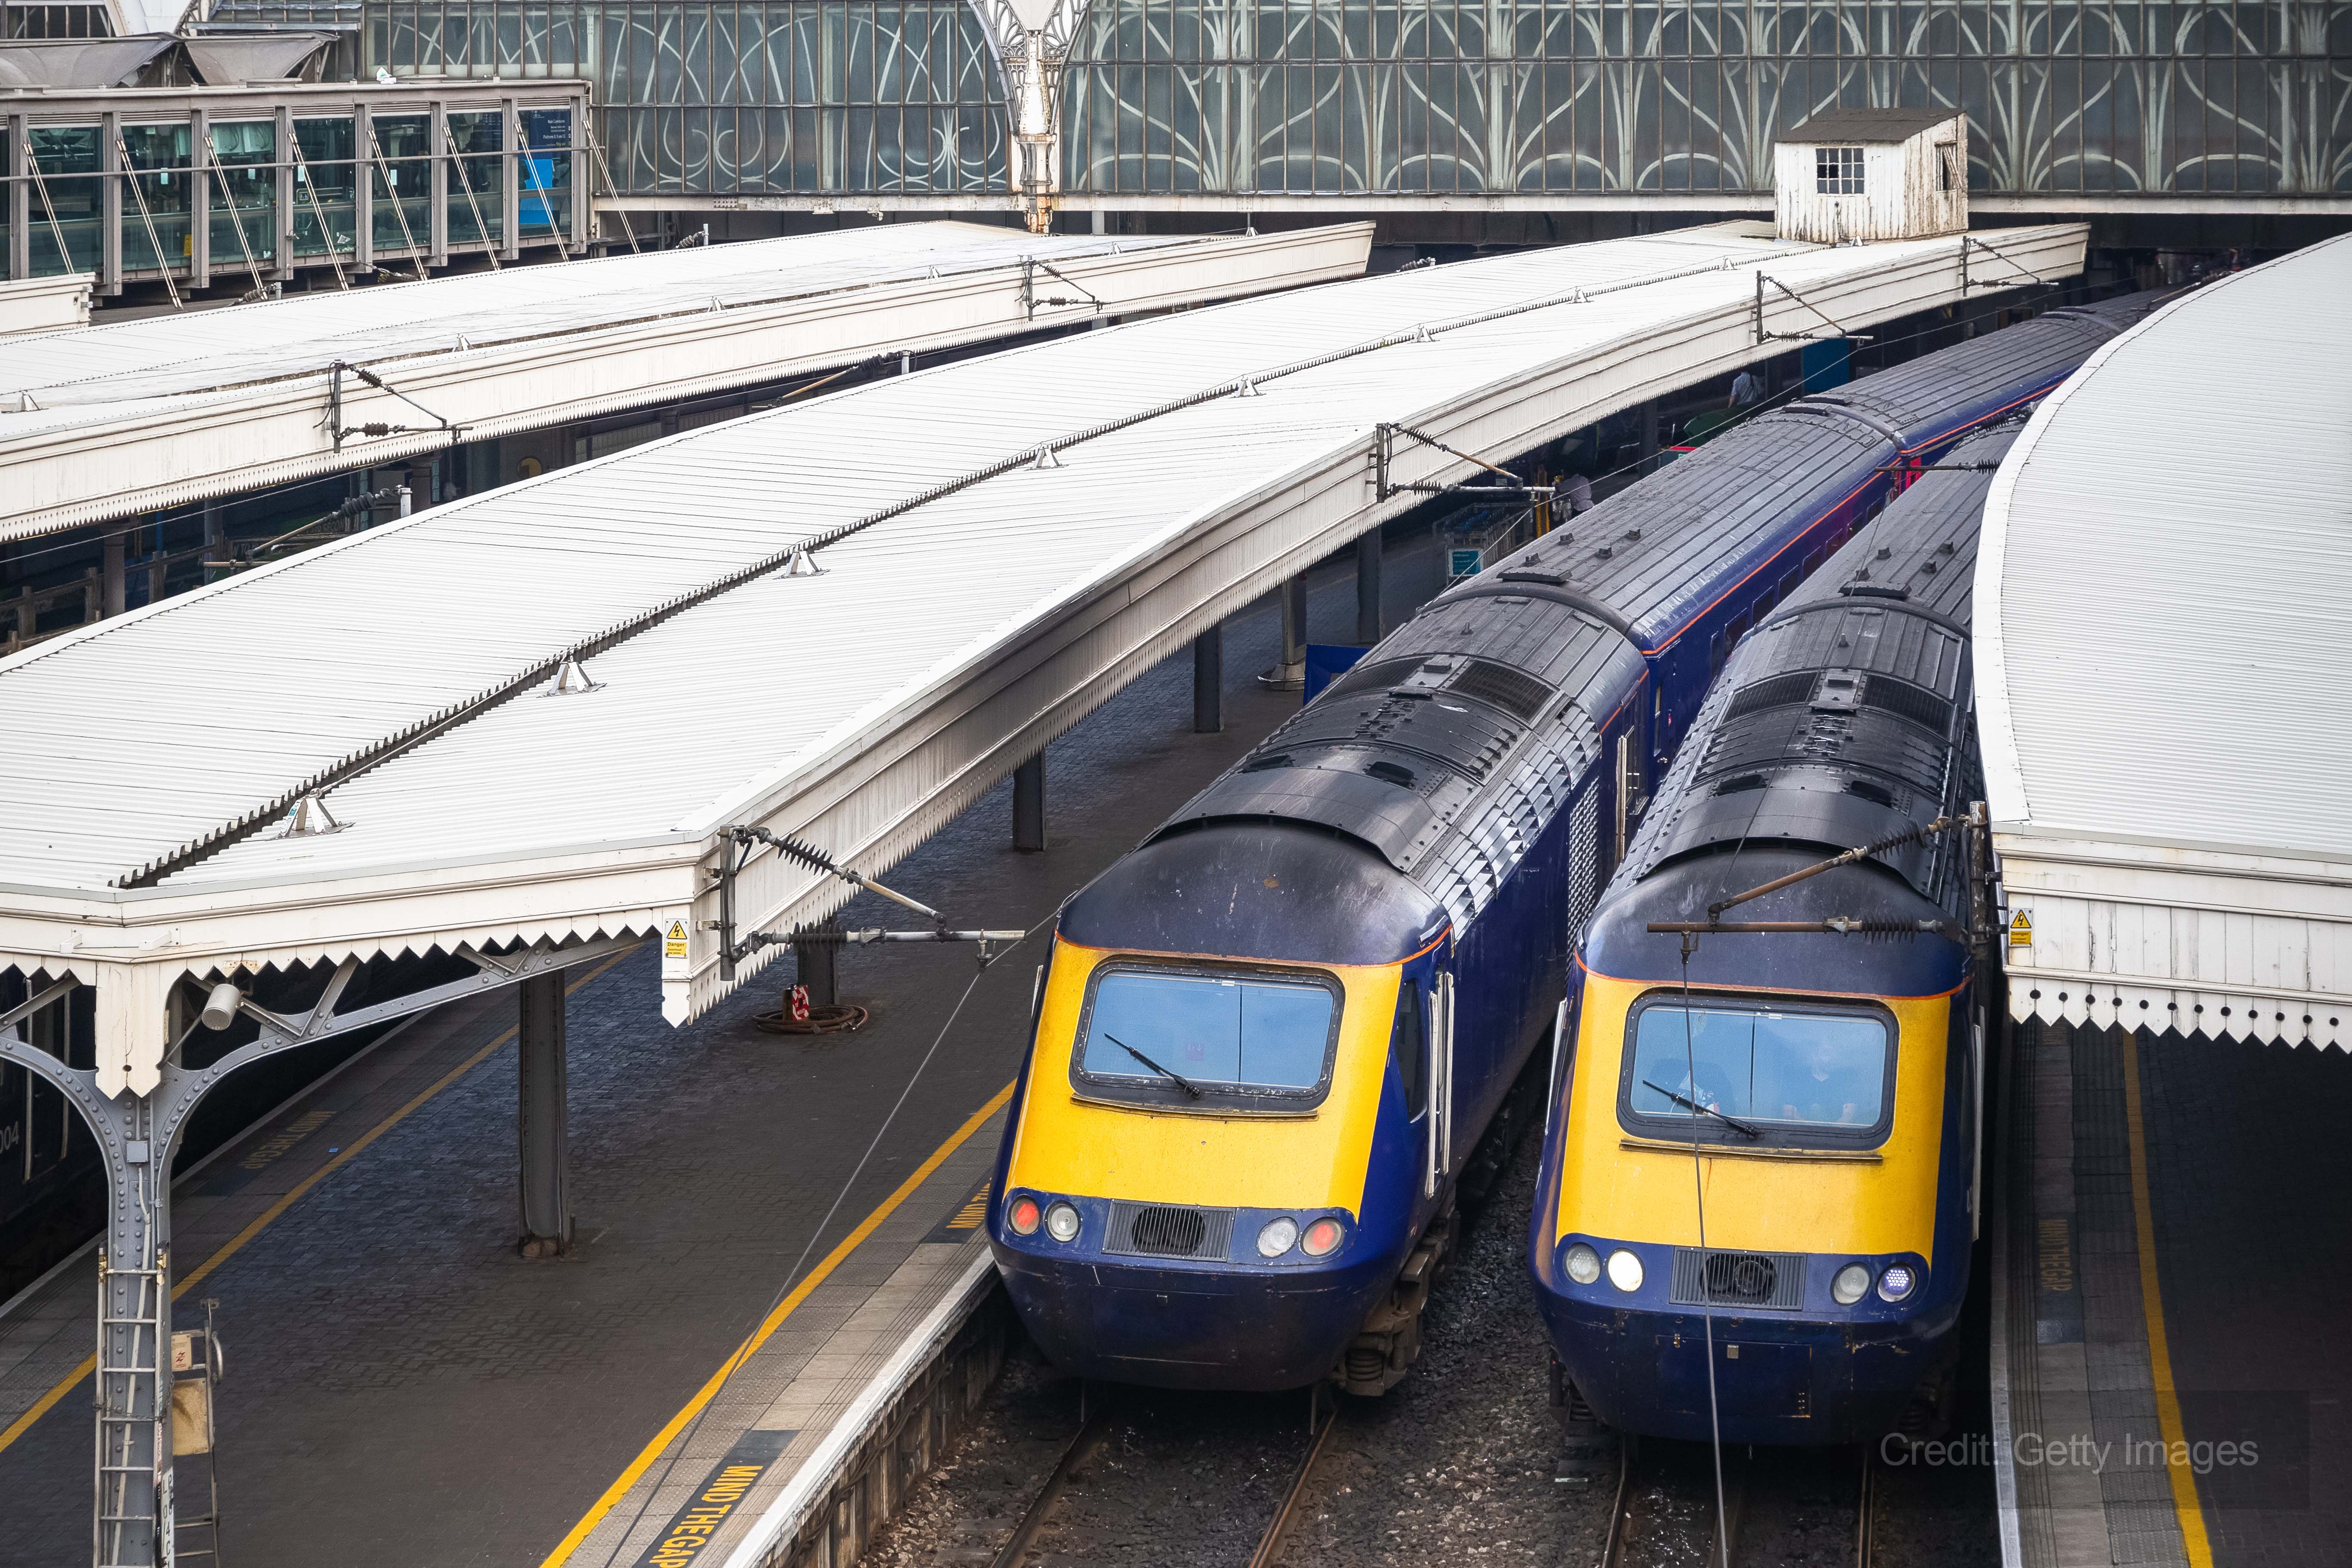 London station seeks emergency intervention after flooding